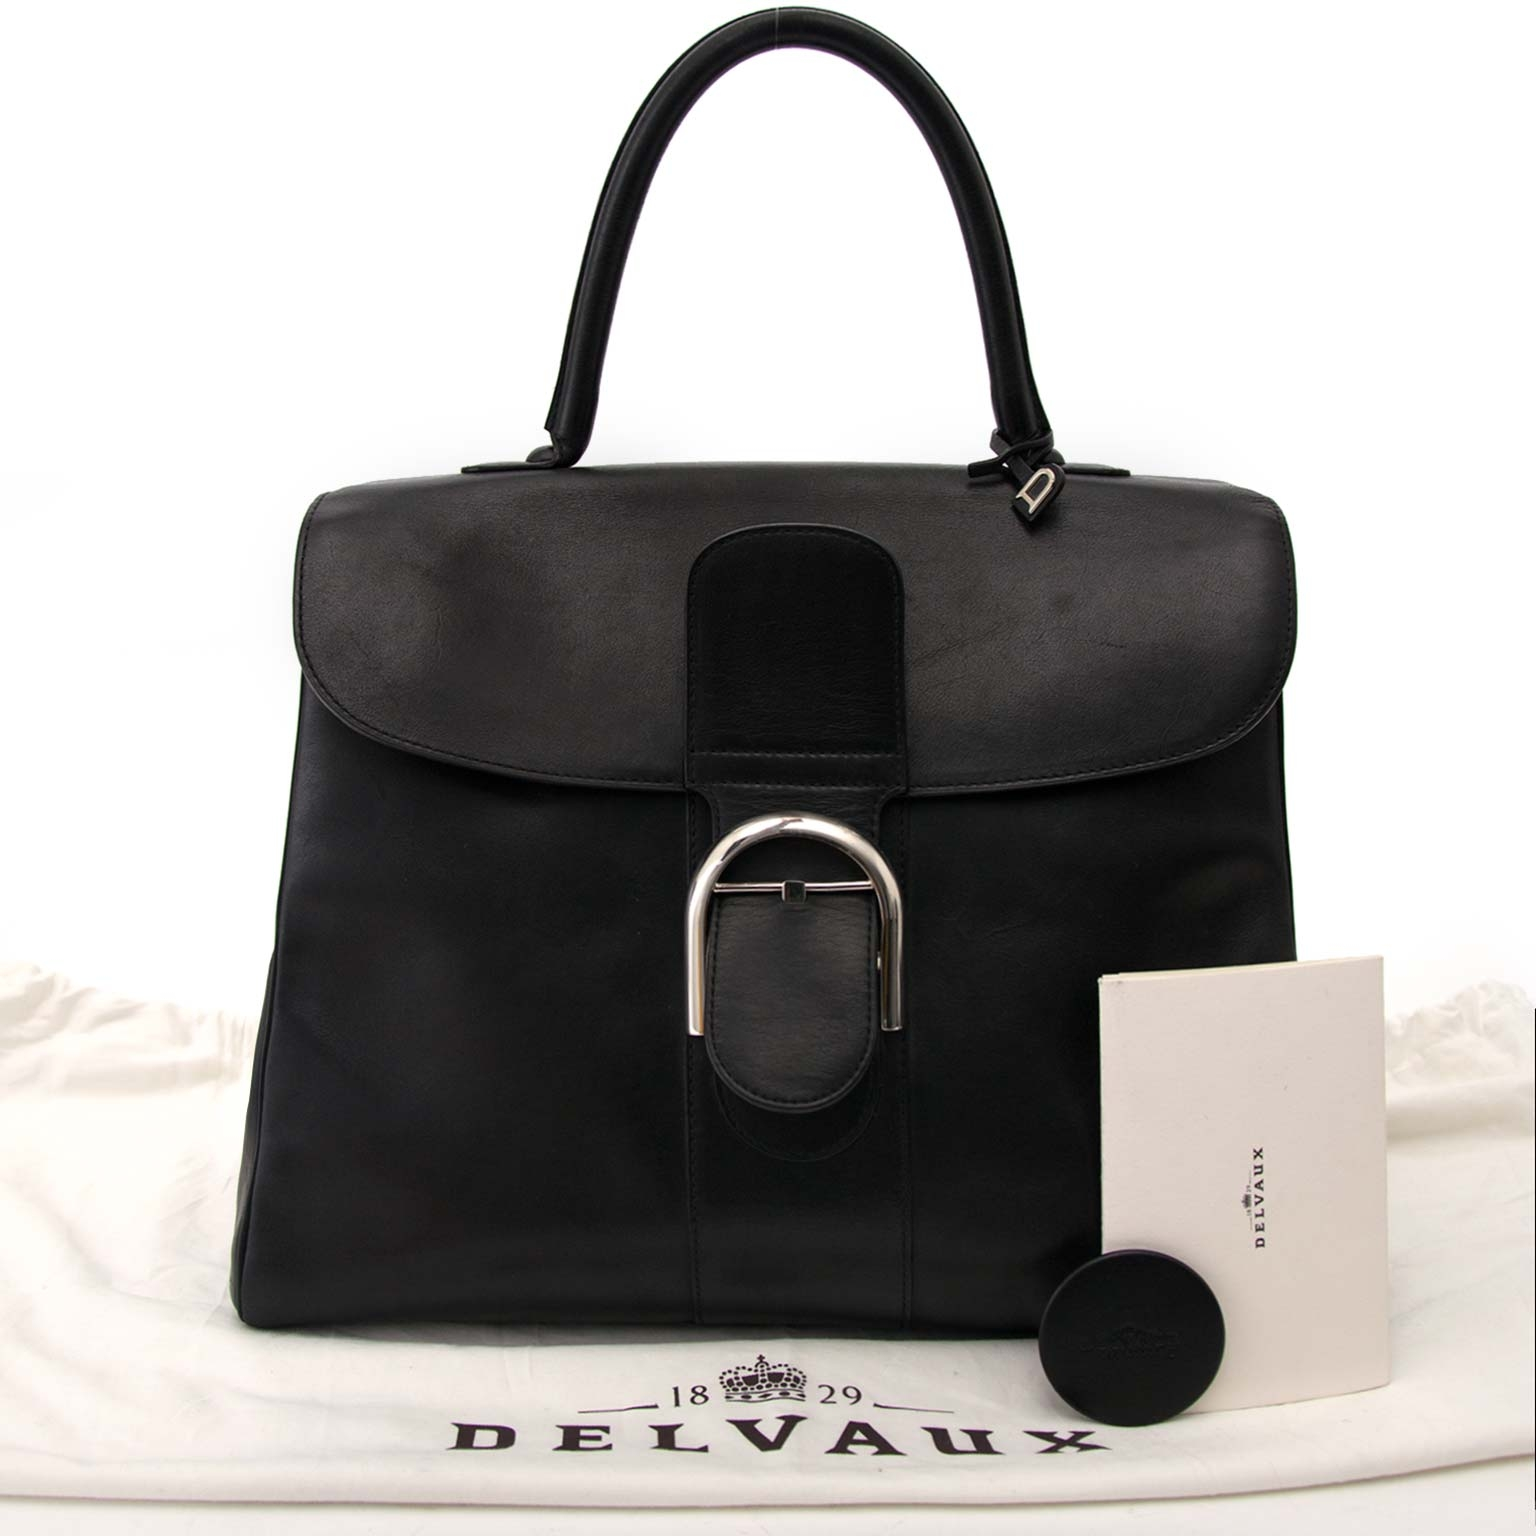 a5315cd54562 ... Delvaux Brillant Black GM Souple Bridon koop veilig online tegen de  beste prijs Delvaux Brillant Black